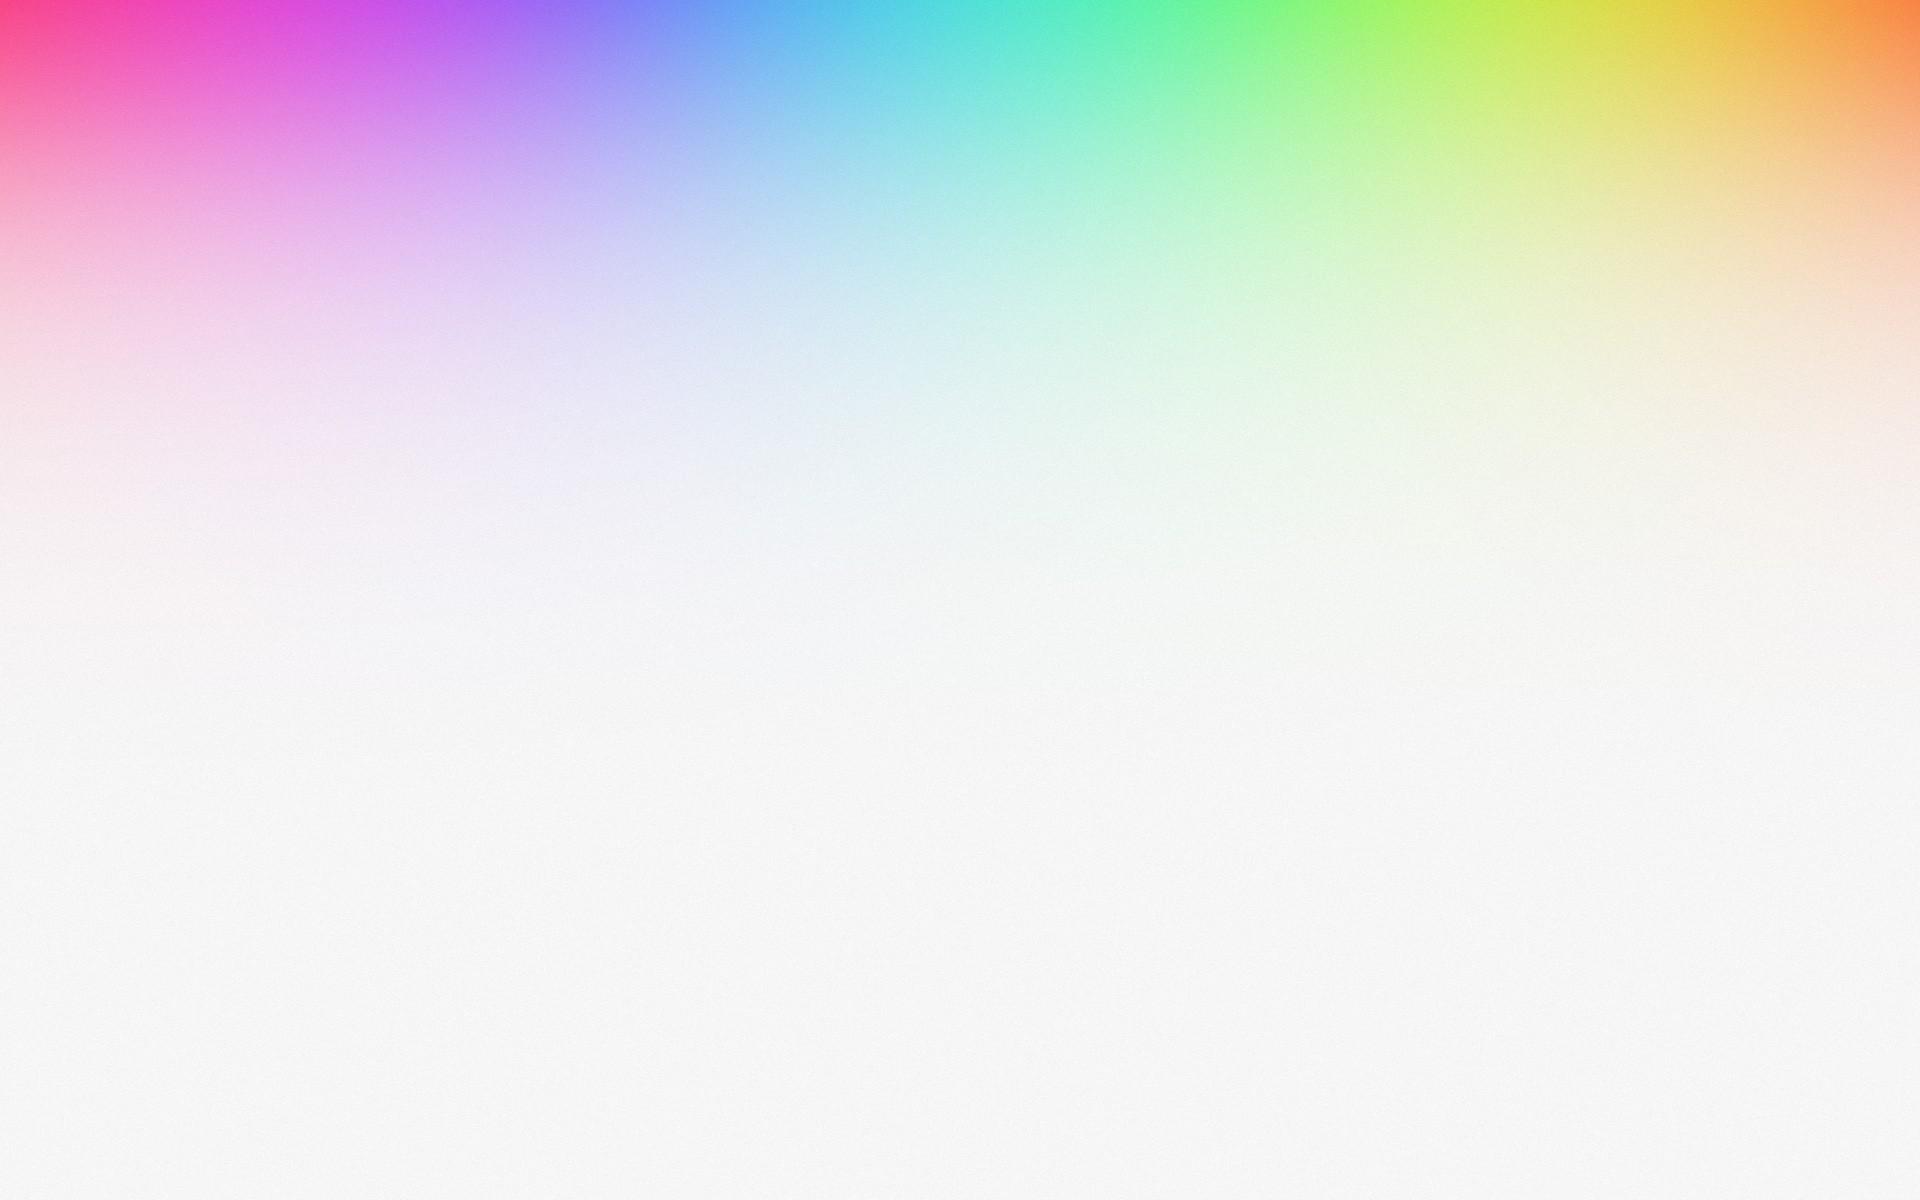 Plain Bwhite Background Wallpaperb Hd Simple Designs